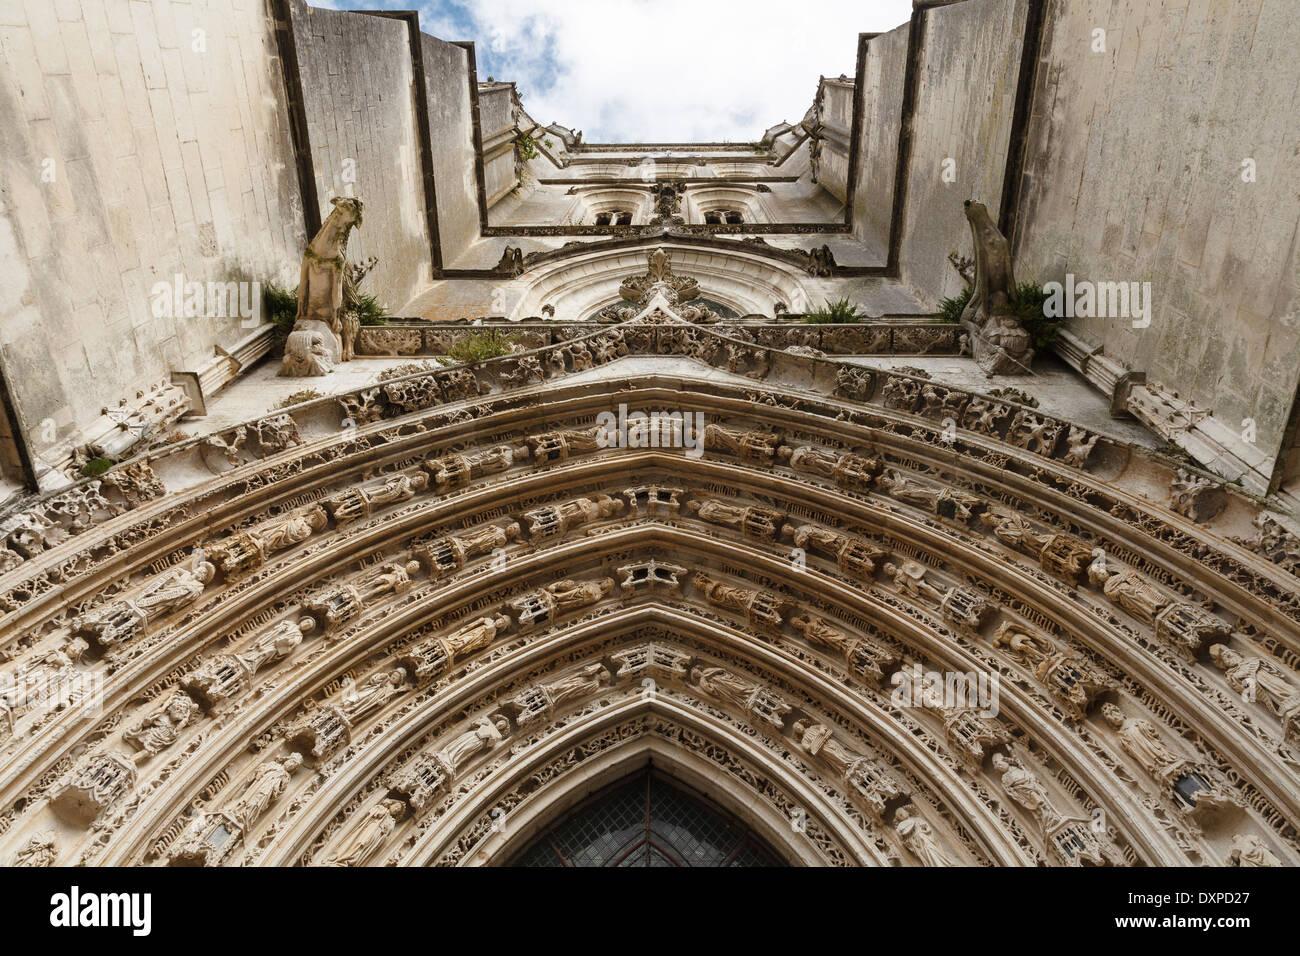 The arched entrance and tower of the Cathédrale Saint-Pierre, Saintes, Poitou-Charente, France - Stock Image